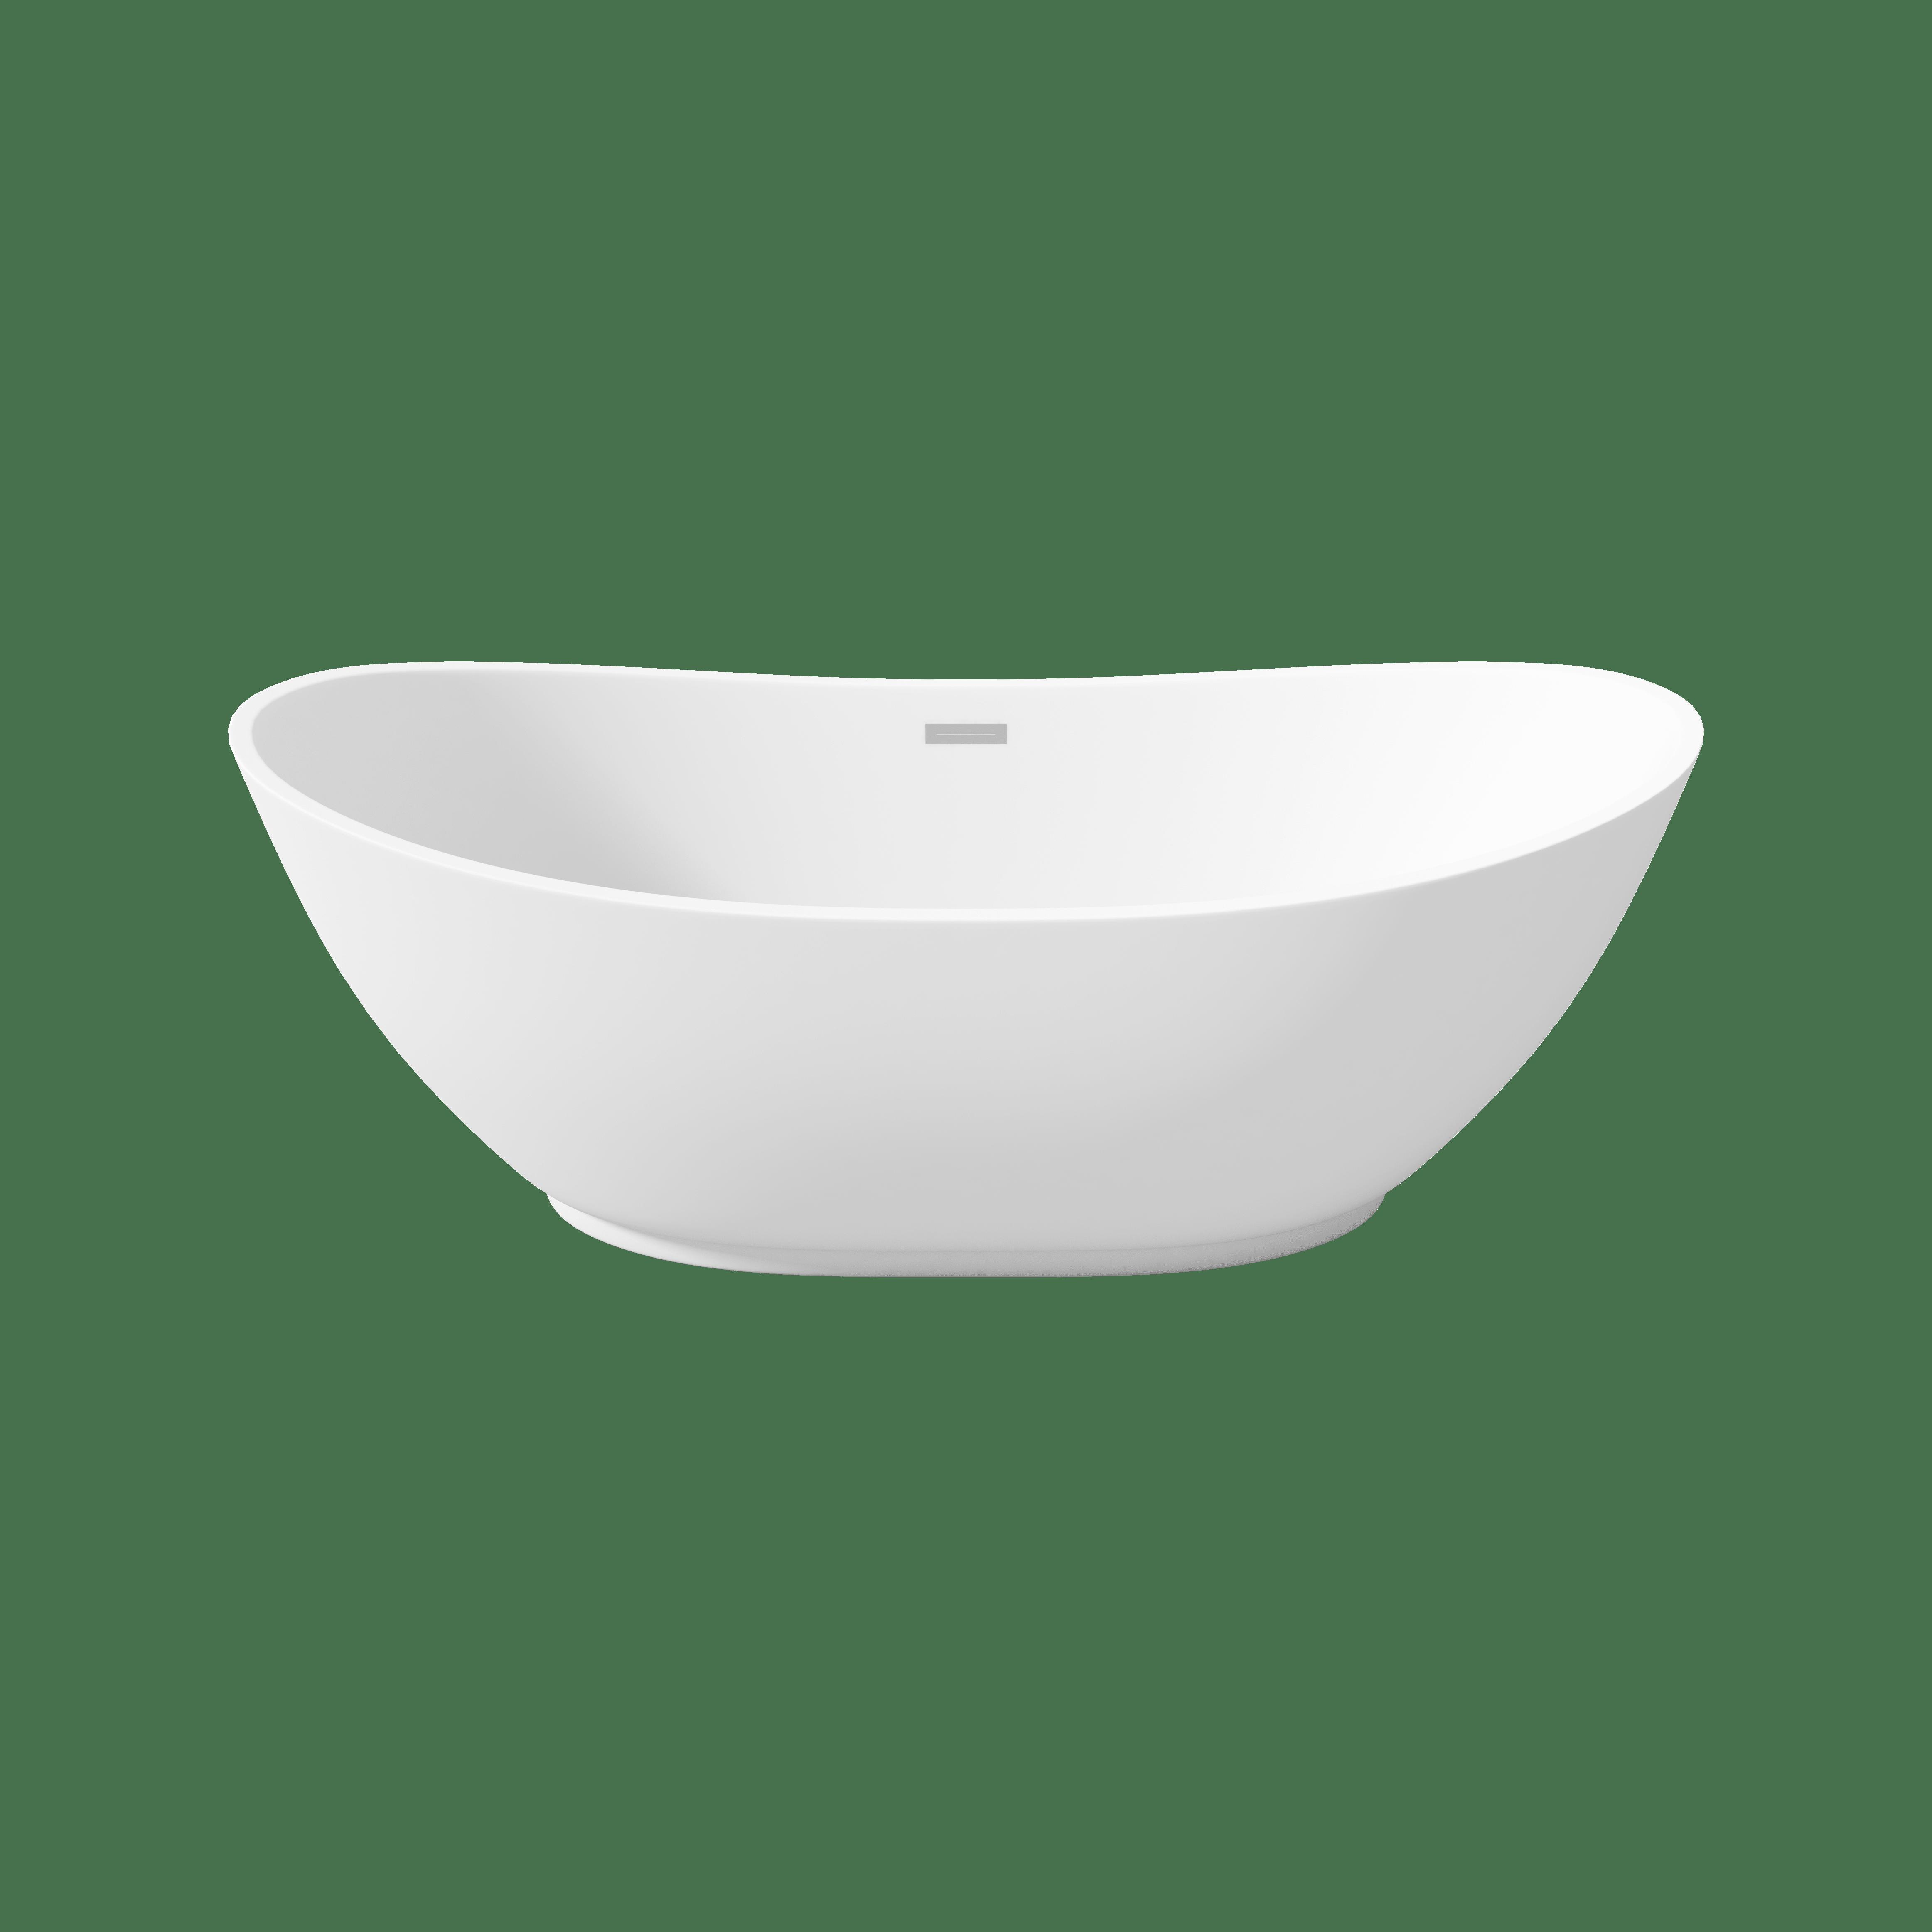 Perlato PTRMA6728 Roma Freestanding Soaker Tub | QualityBath.com